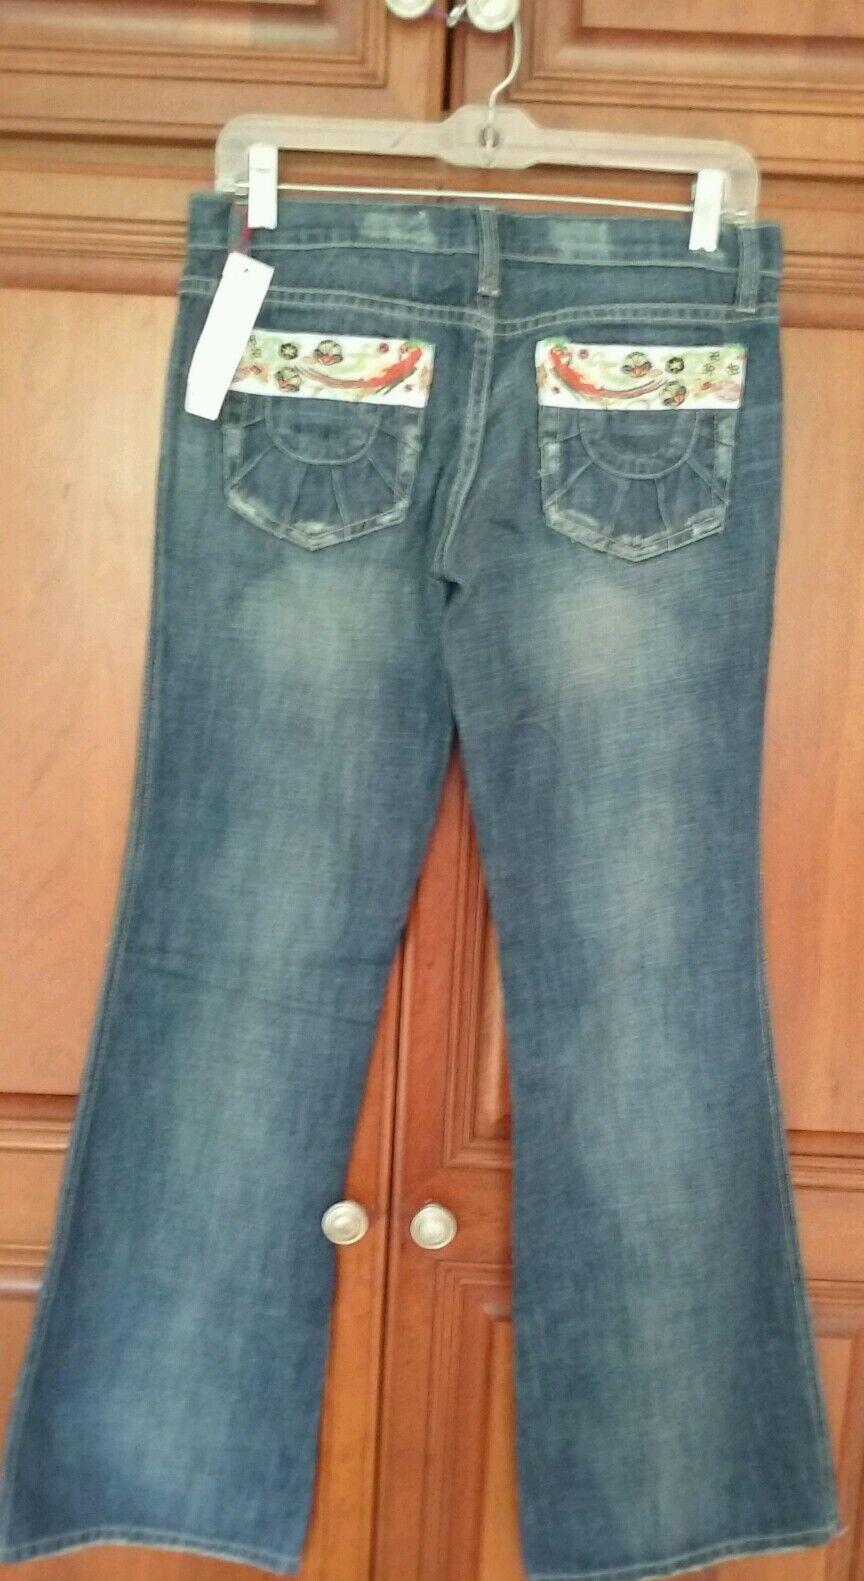 Joe's Jeans Embroiderot Flowers damen Pants 27 X 32 NWT